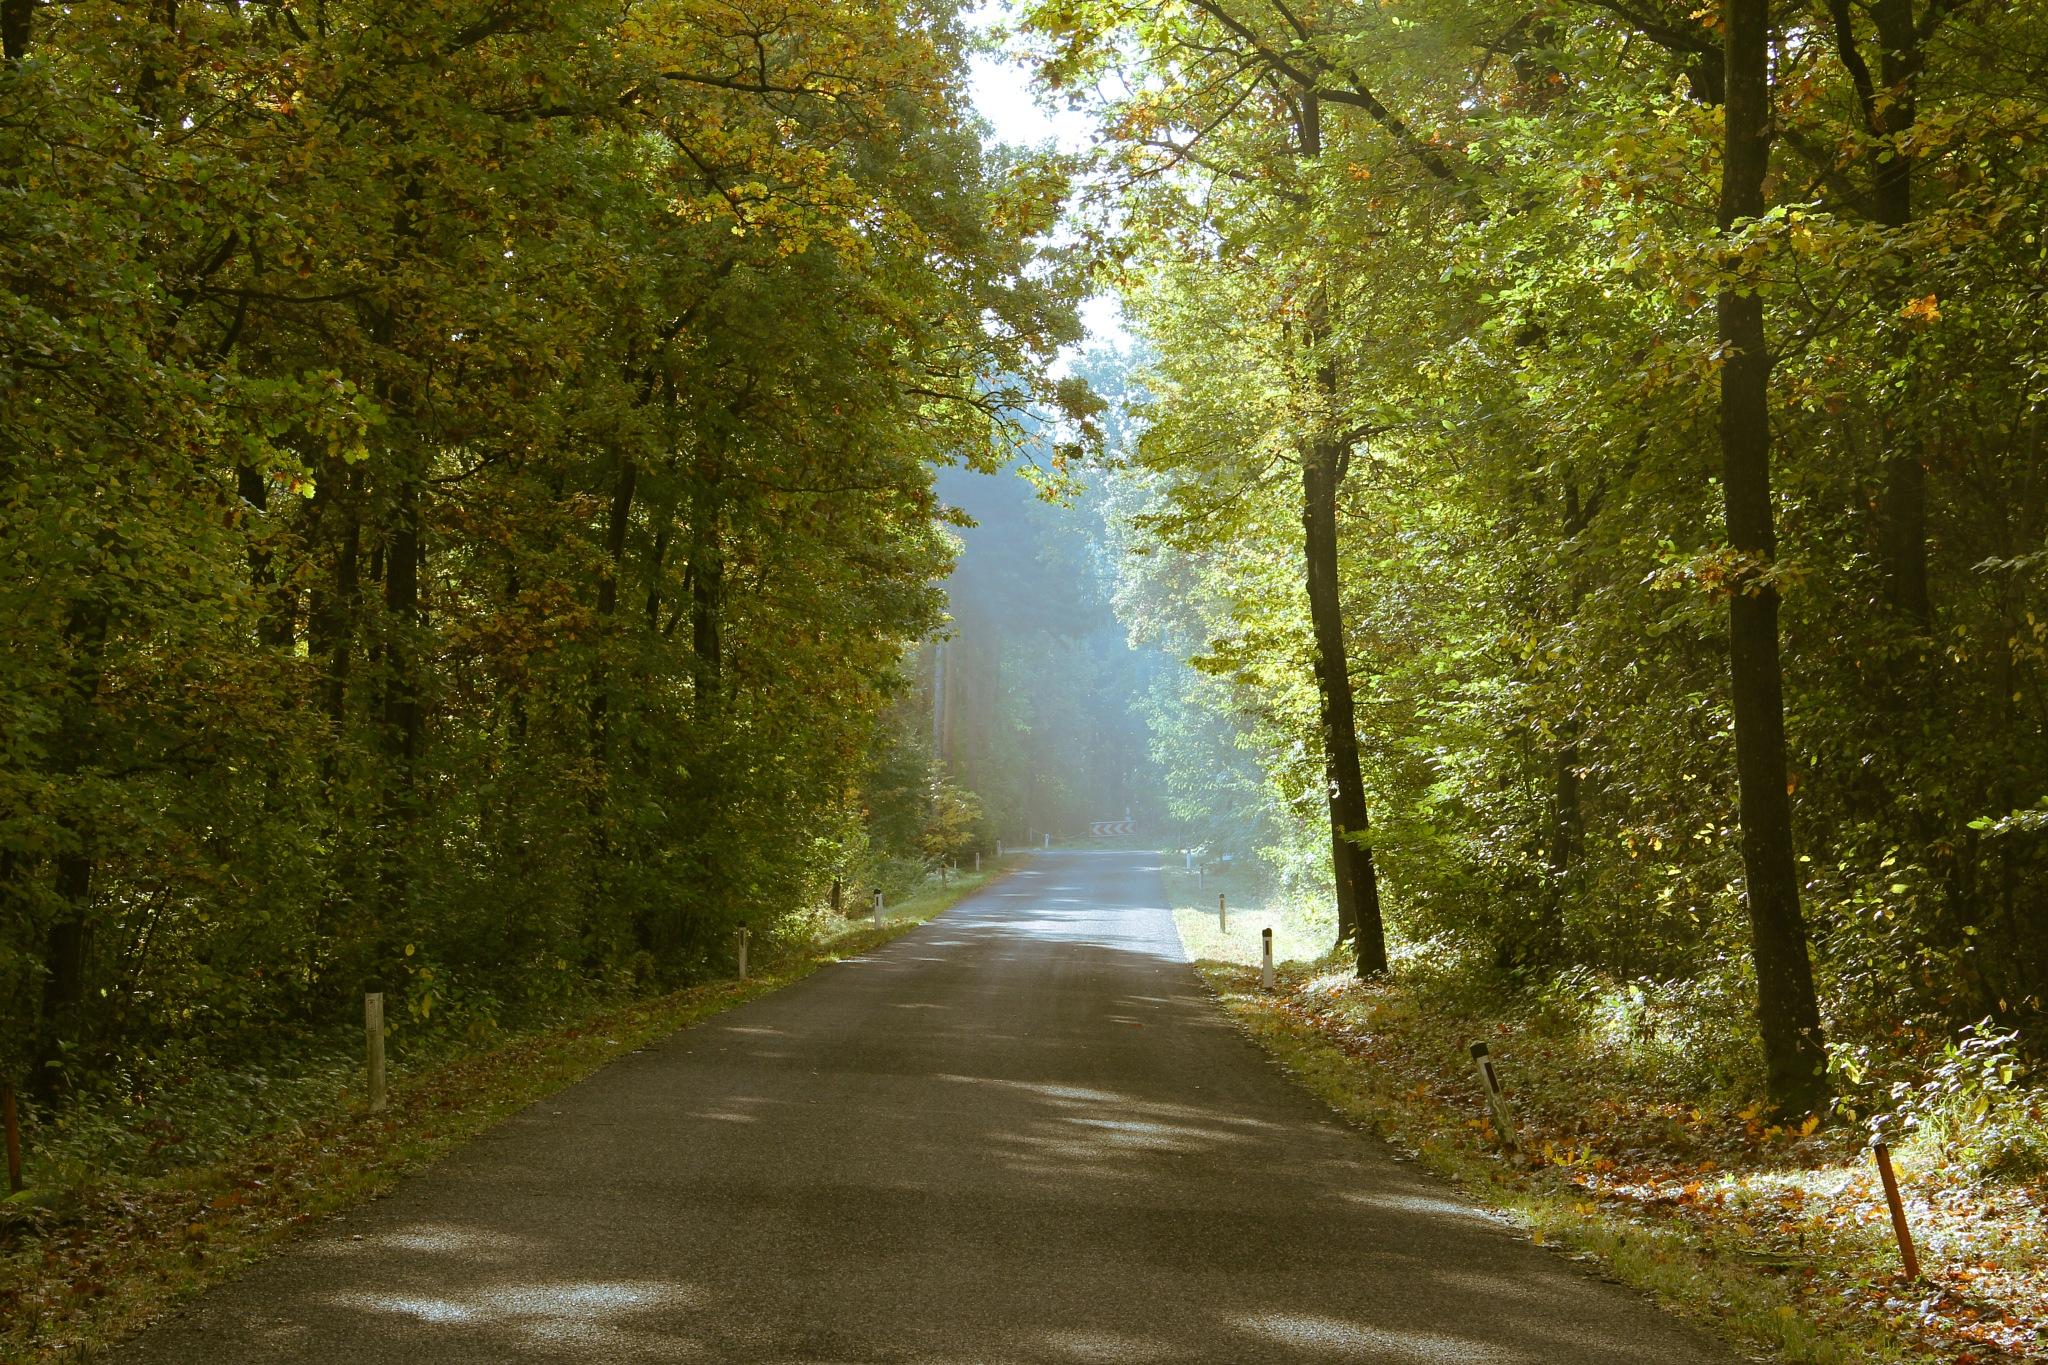 Herbst by Bettina Herz